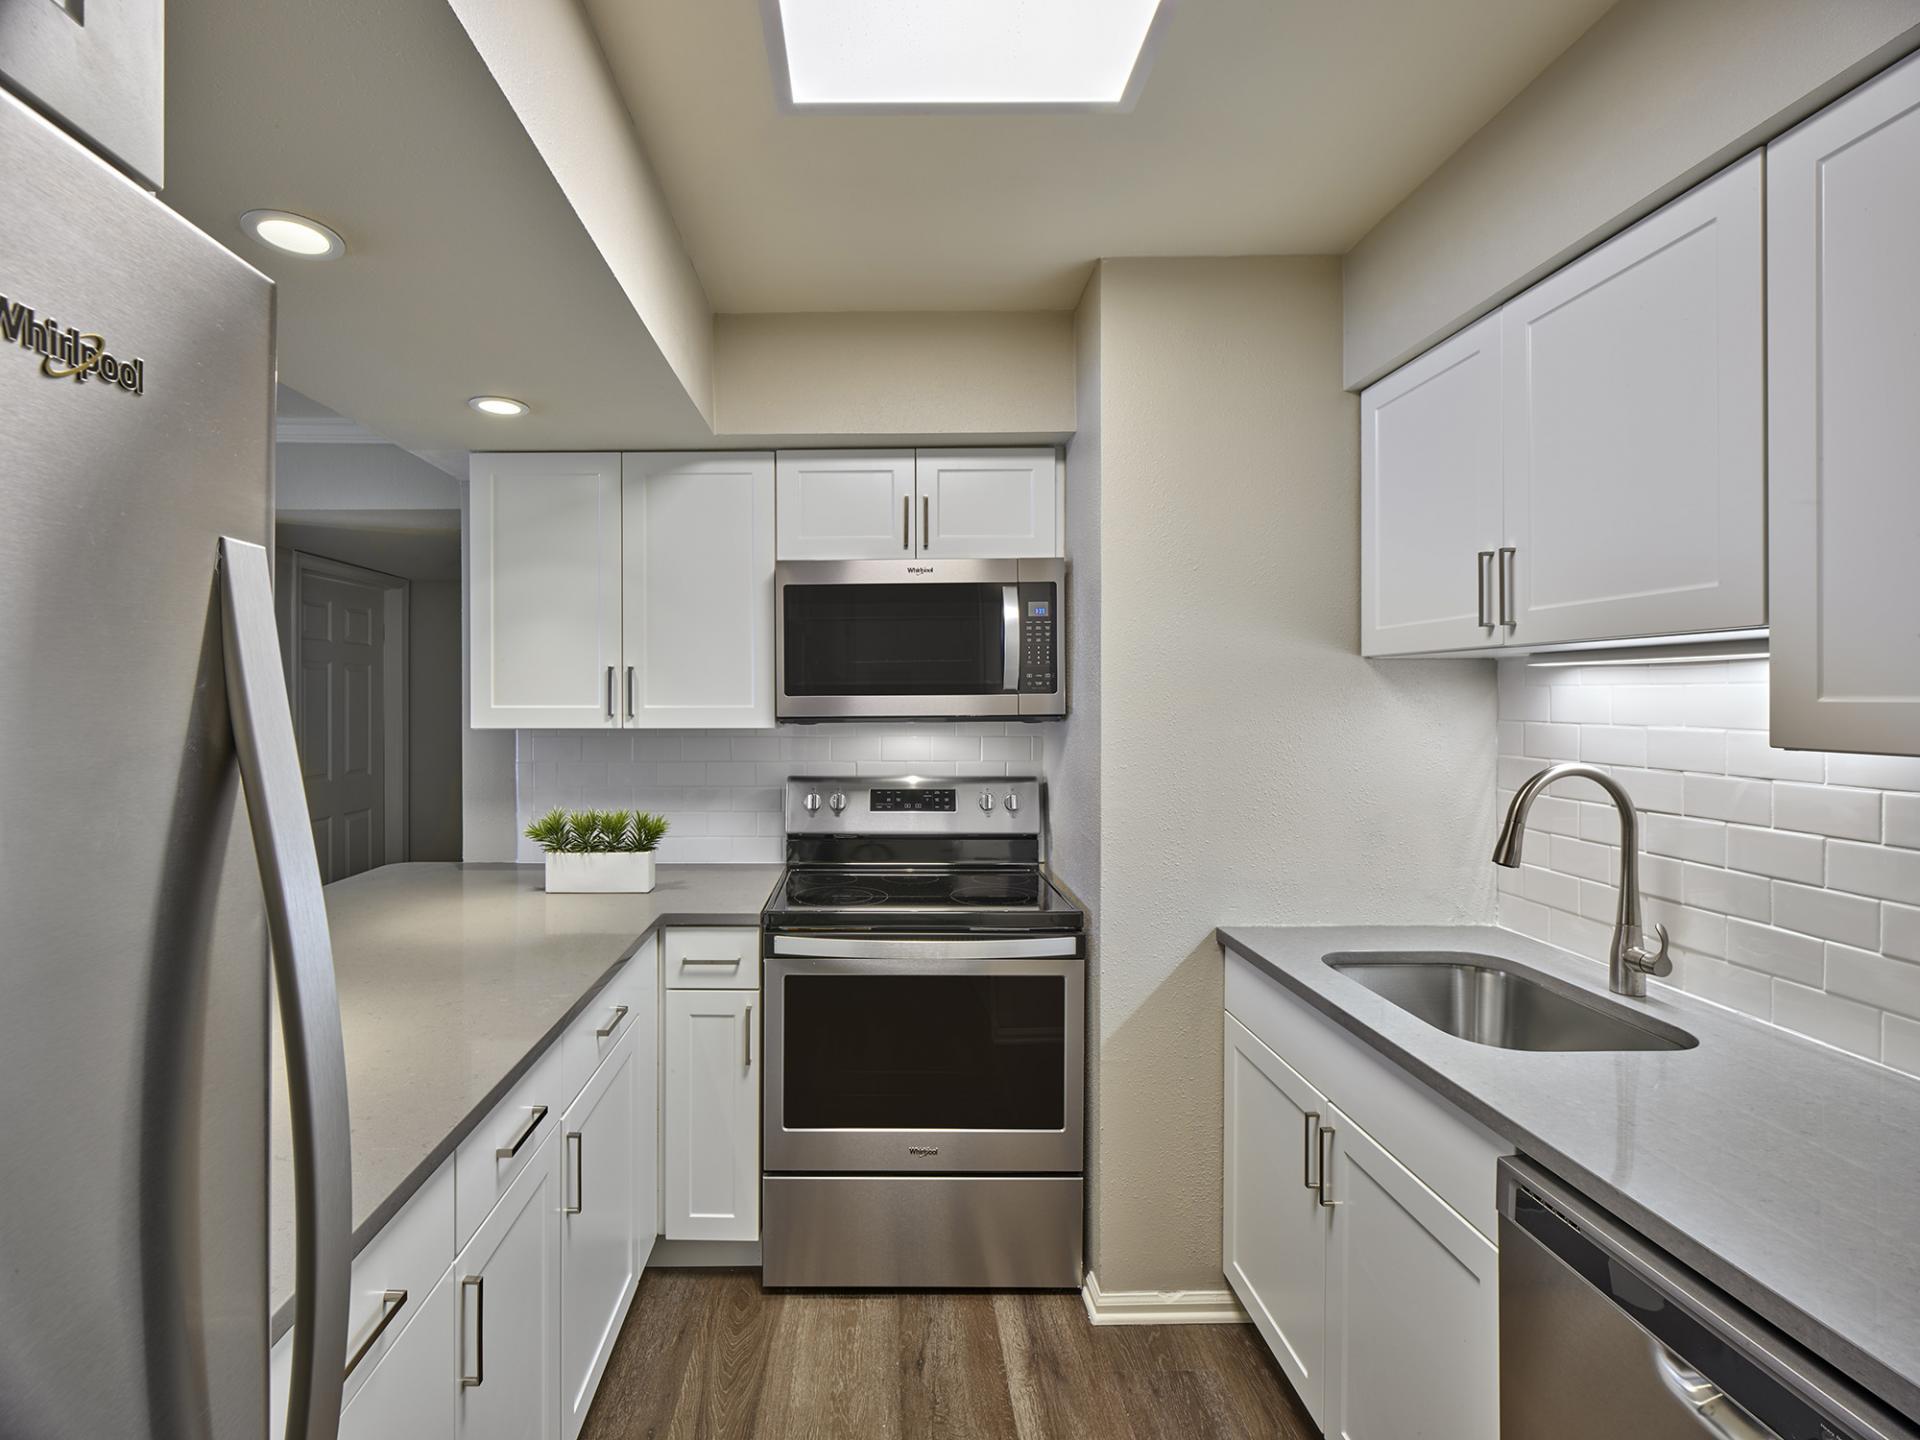 Kitchen at AVE Malvern Apartments